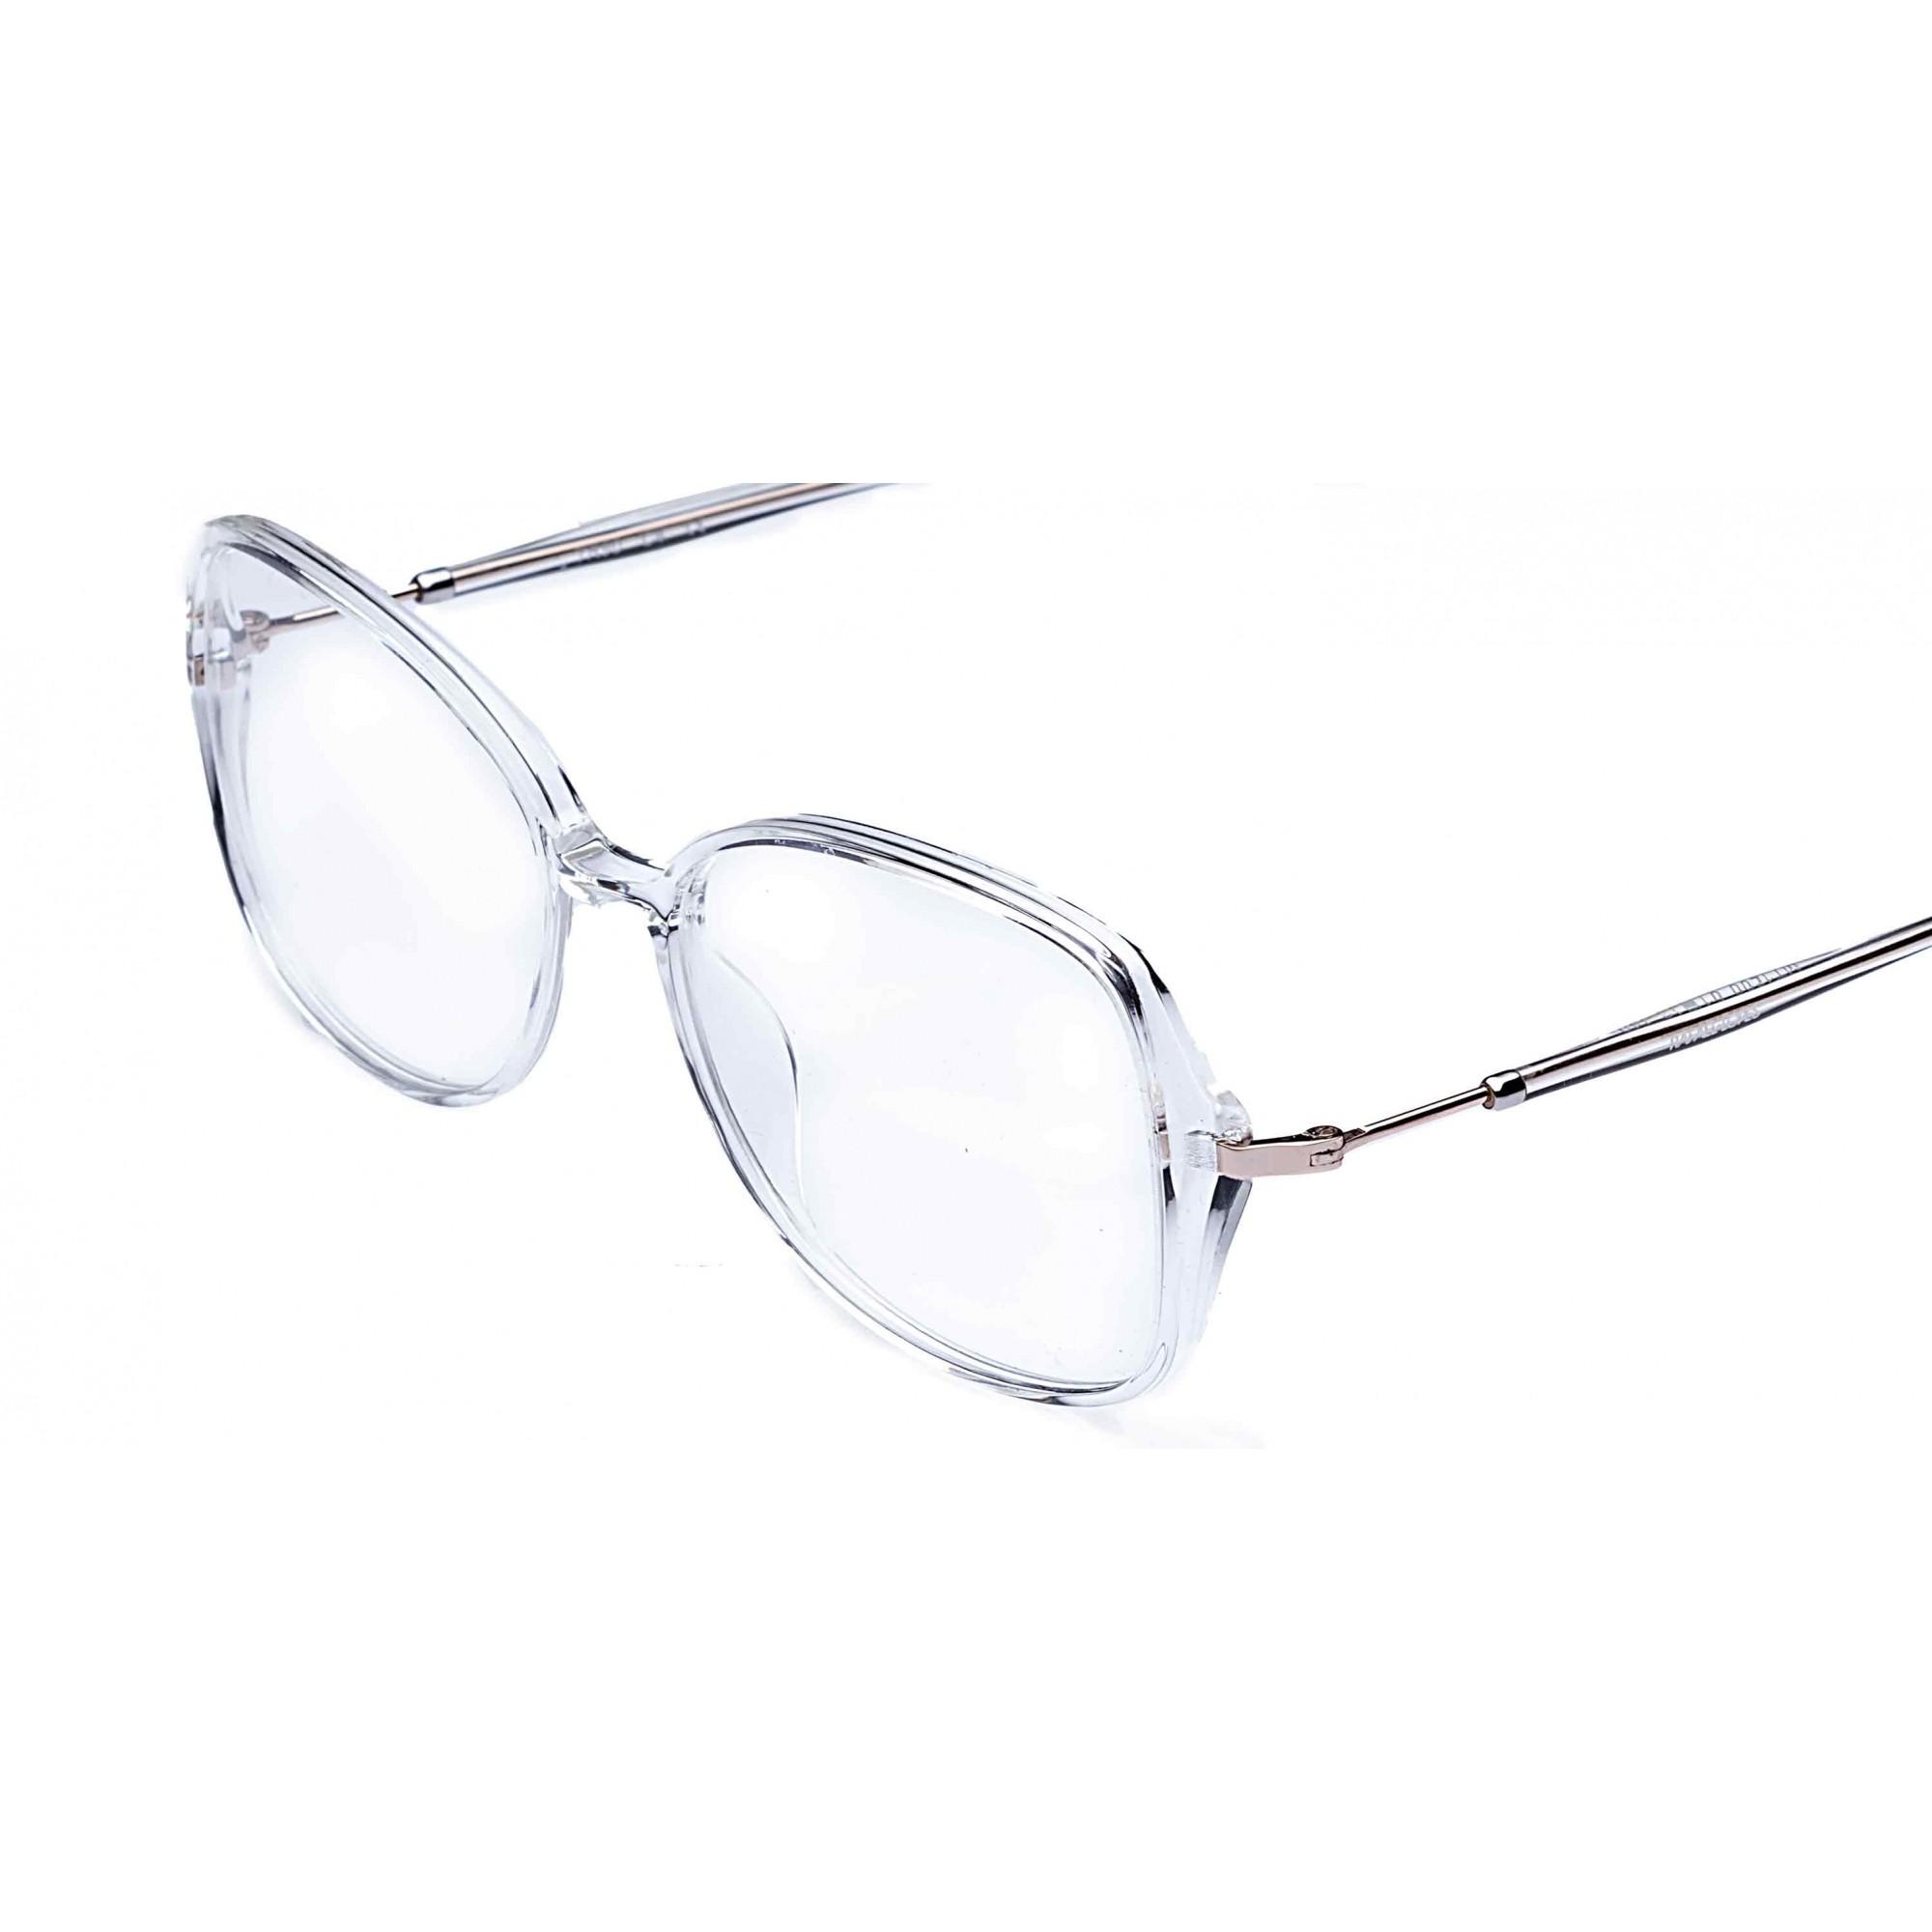 Óculos de Grau Charme Rafael Lopes